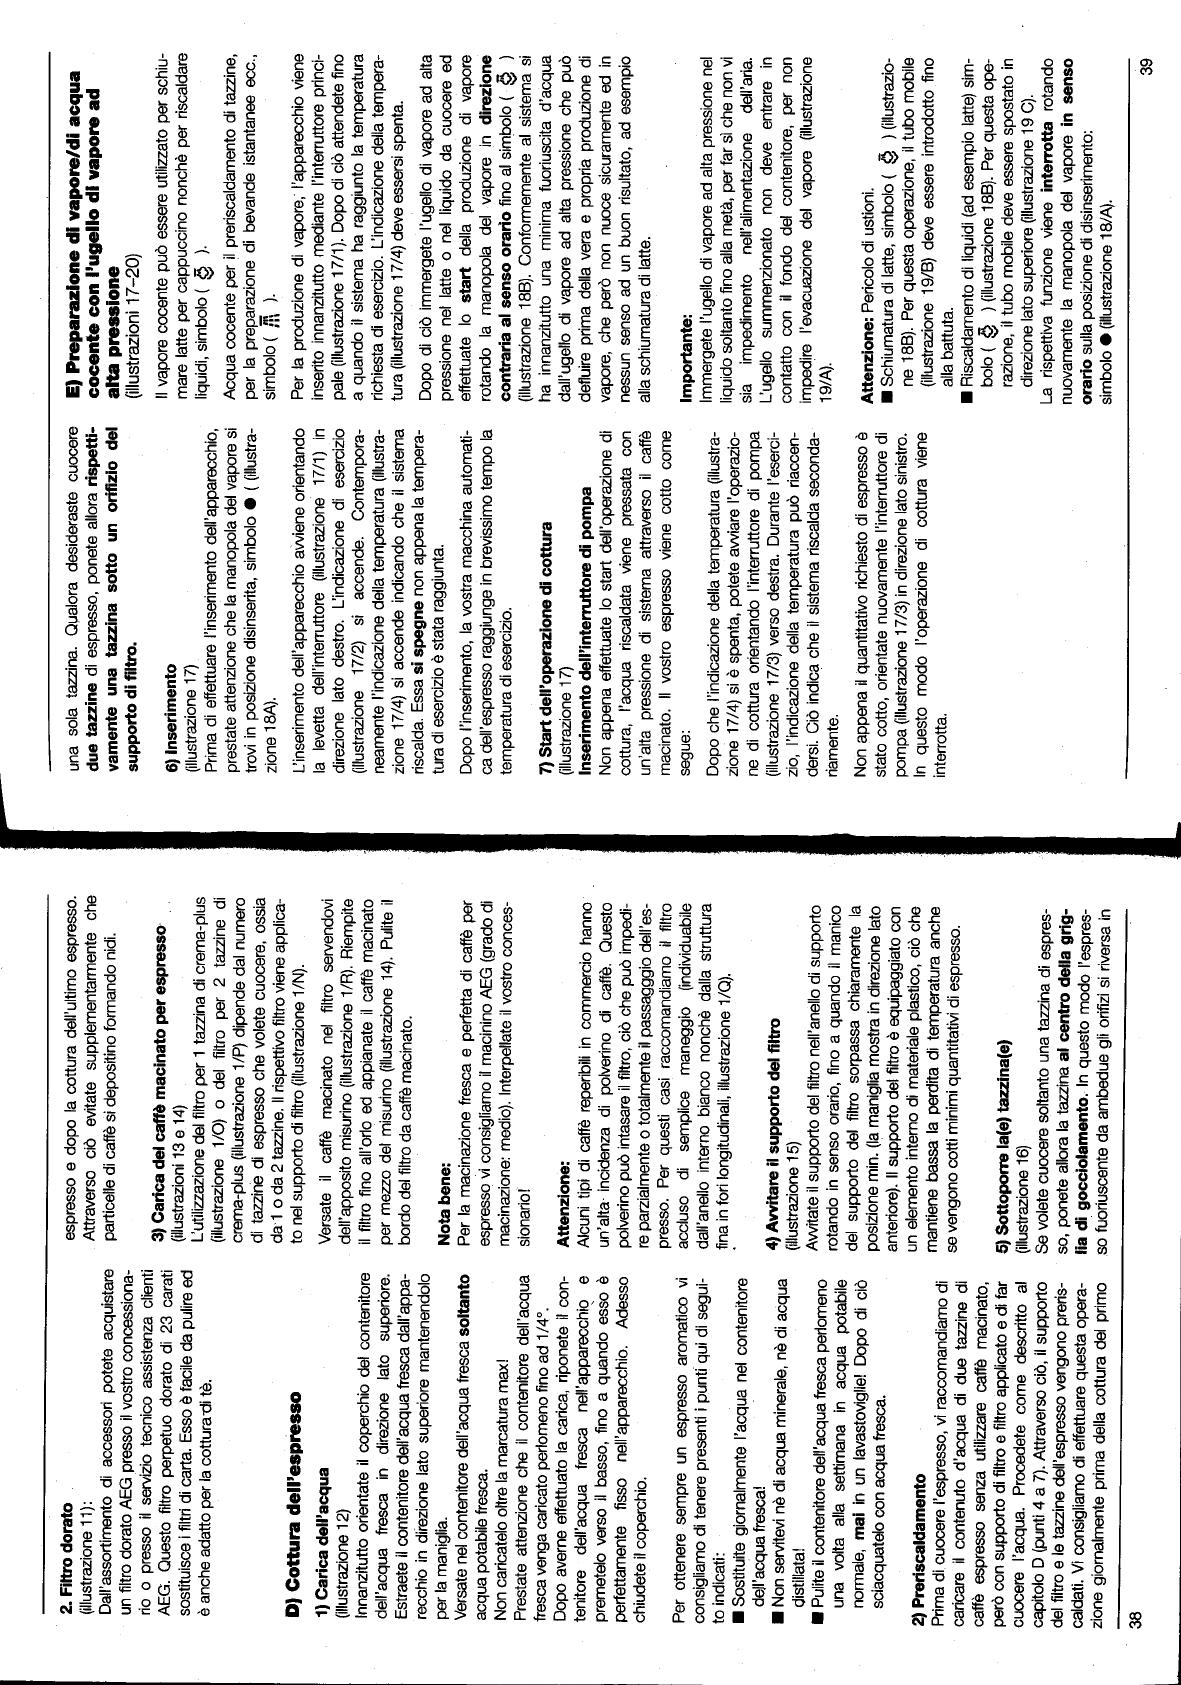 Schiumatura Ad Acqua.Handleiding Aeg Electrolux Kfea 100 Crema Pagina 9 Van 11